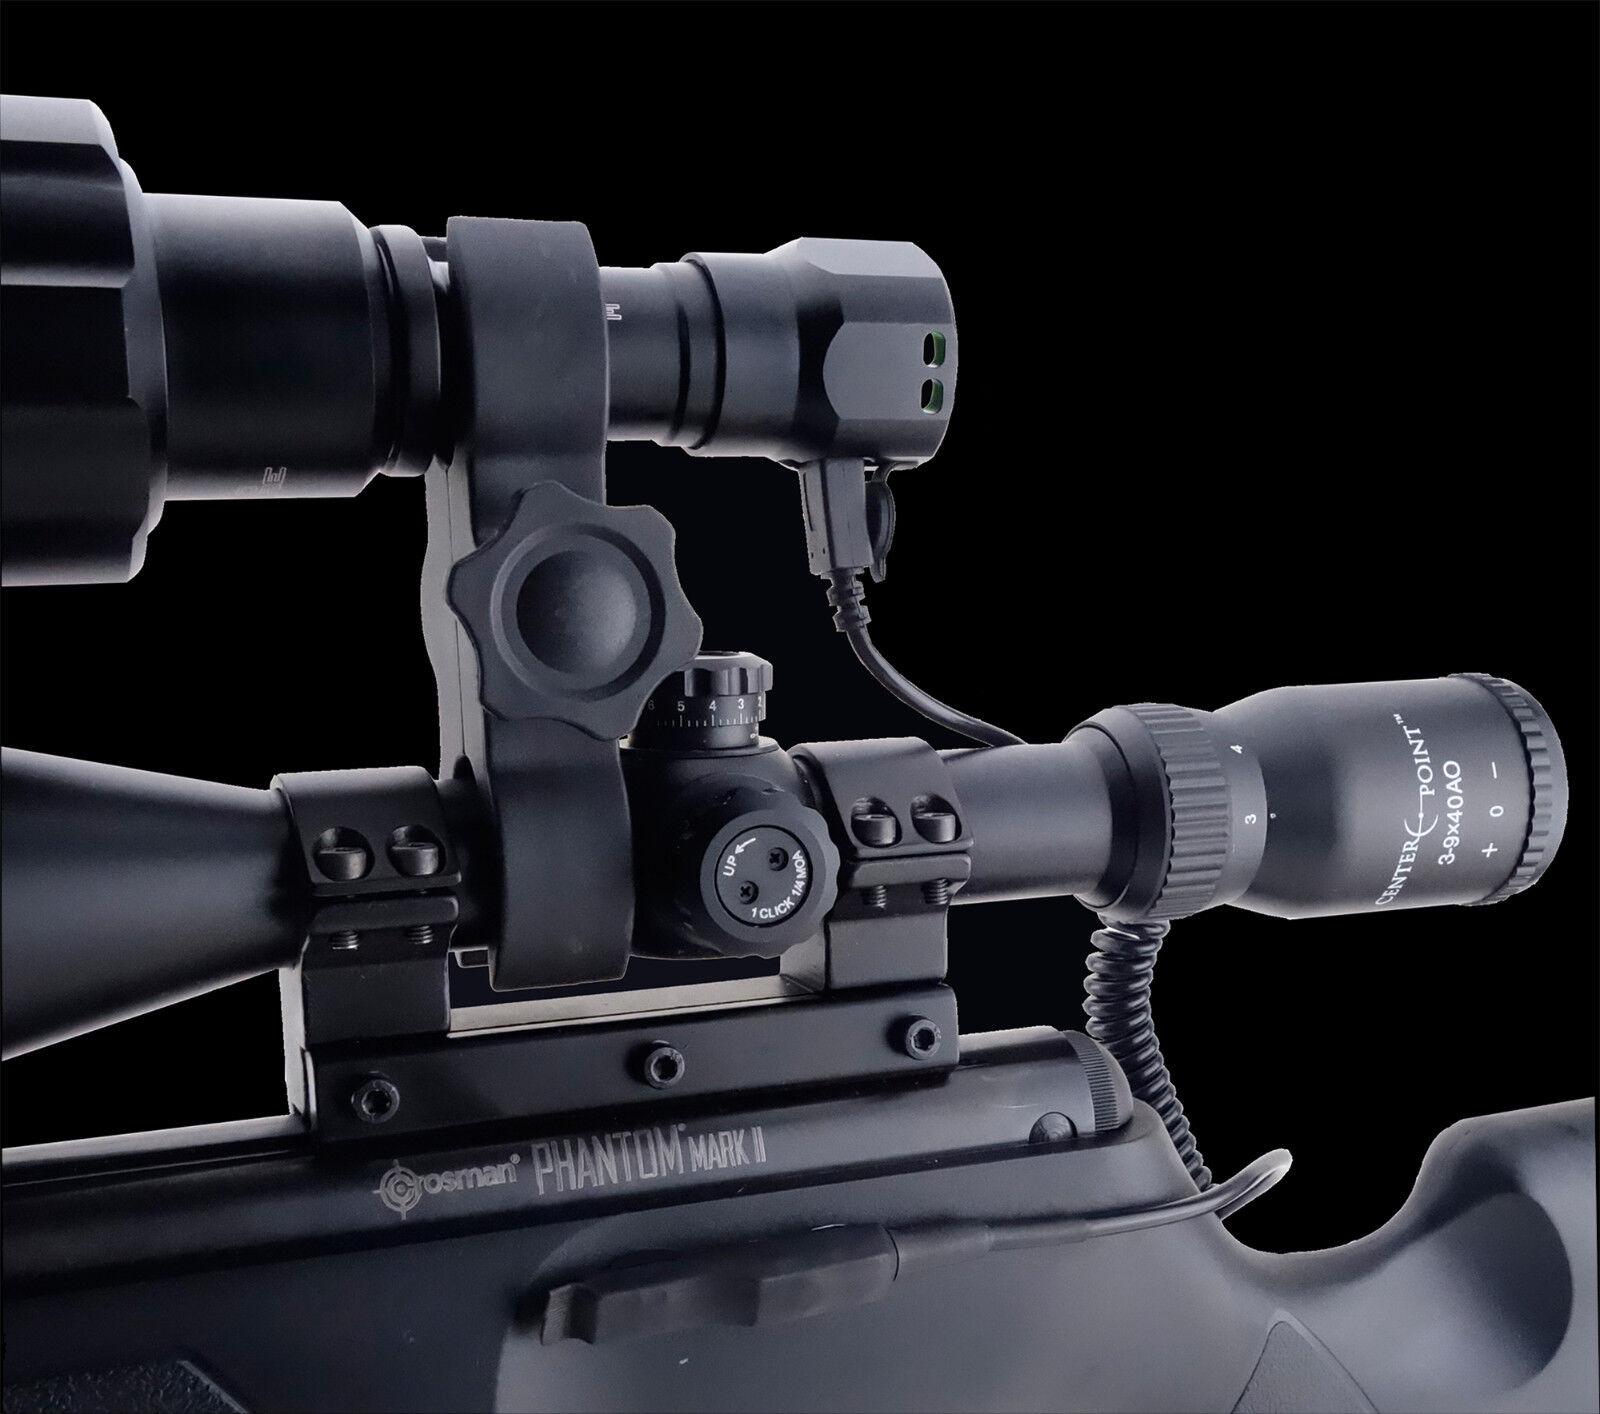 Figure De 8 torche laser Mount 25 mm x 25 mm Rifle Scope torche Support Lamping